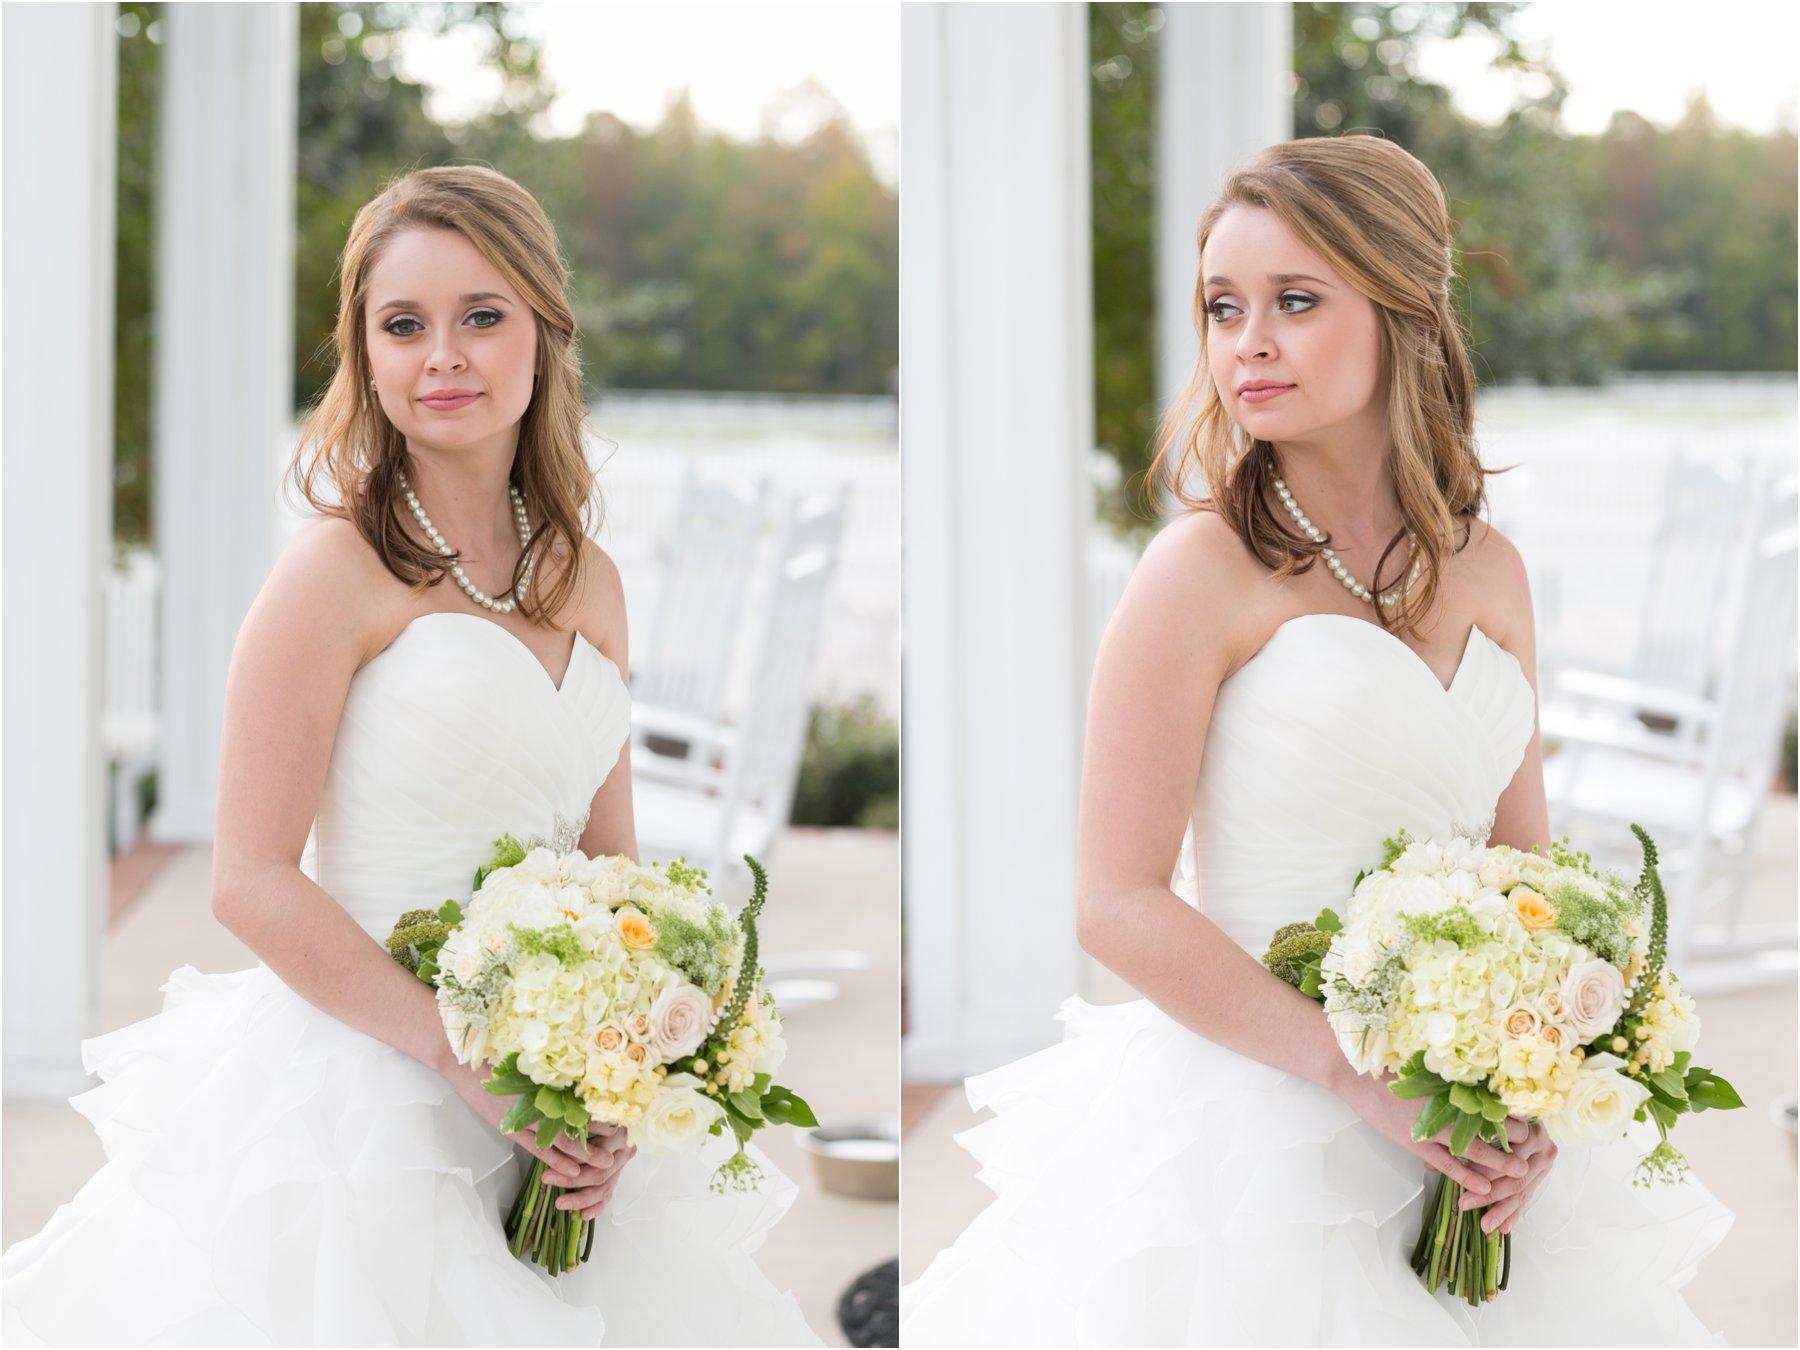 Holly_Ridge_Manor_Wedding_Photography_Jessica_Ryan_Photography_virginia_virginia_beach_0265